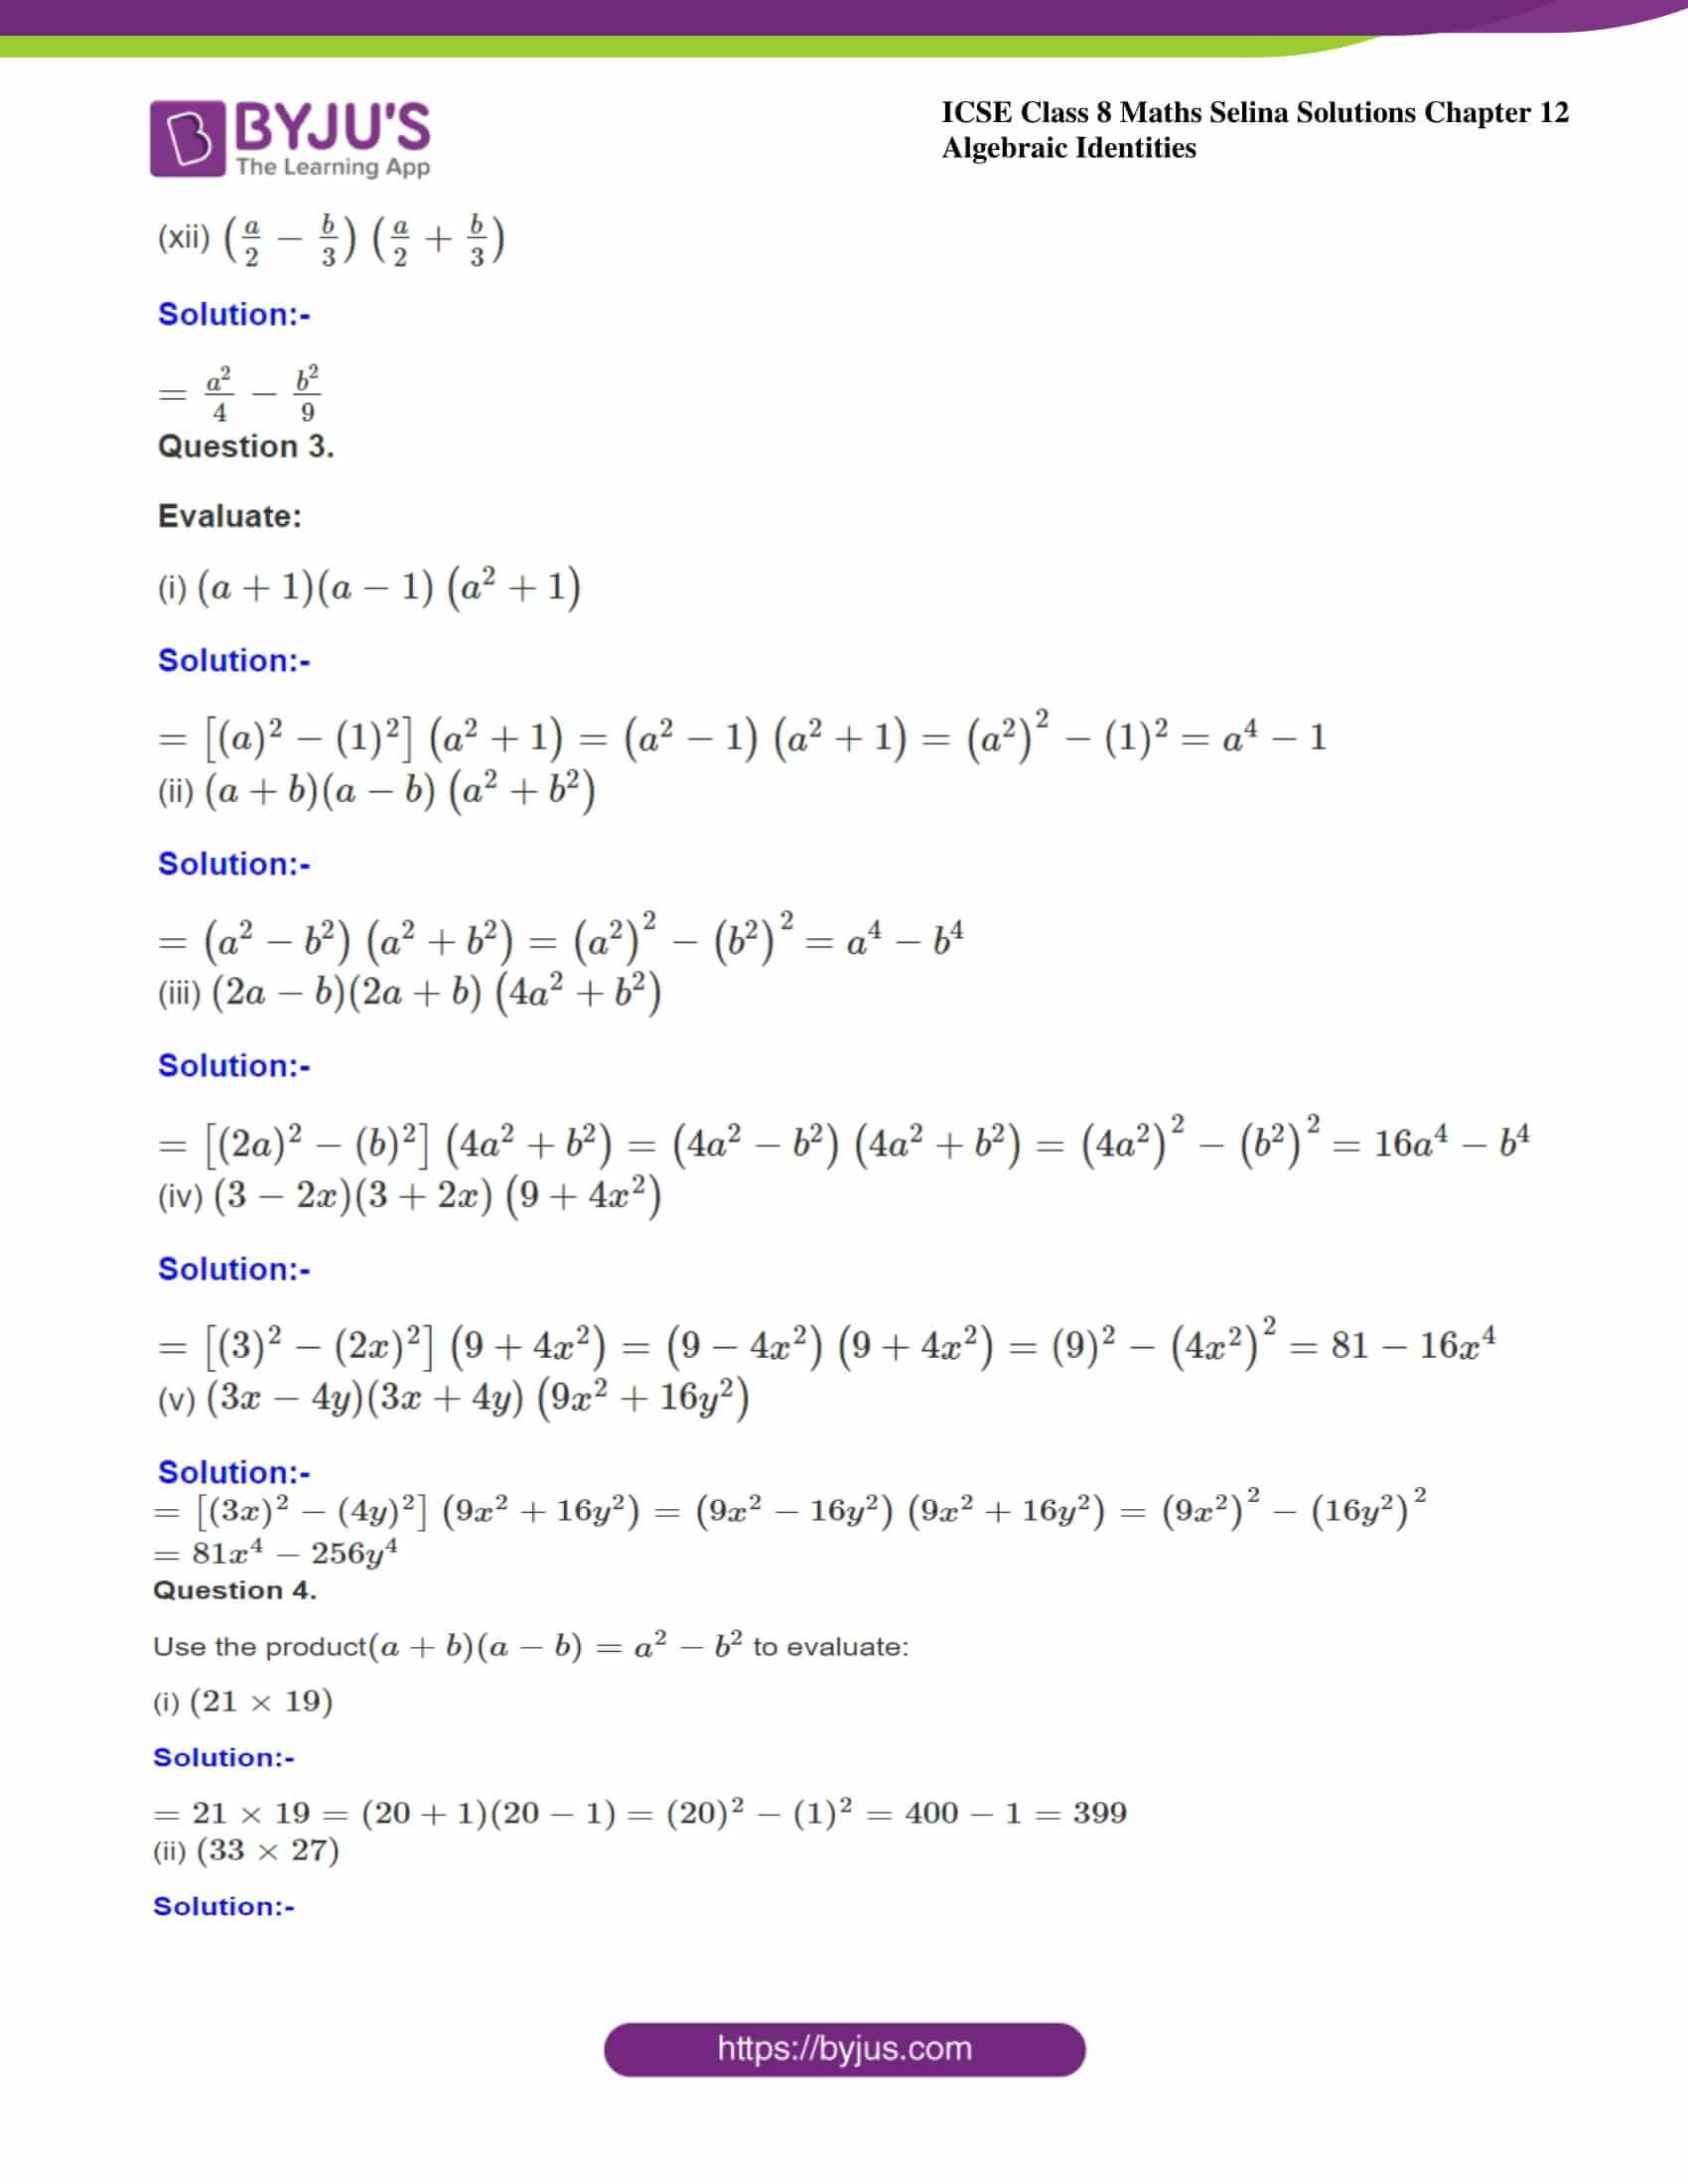 icse class 8 maths may3 selina solutions chapter 12 algebraic identities 03